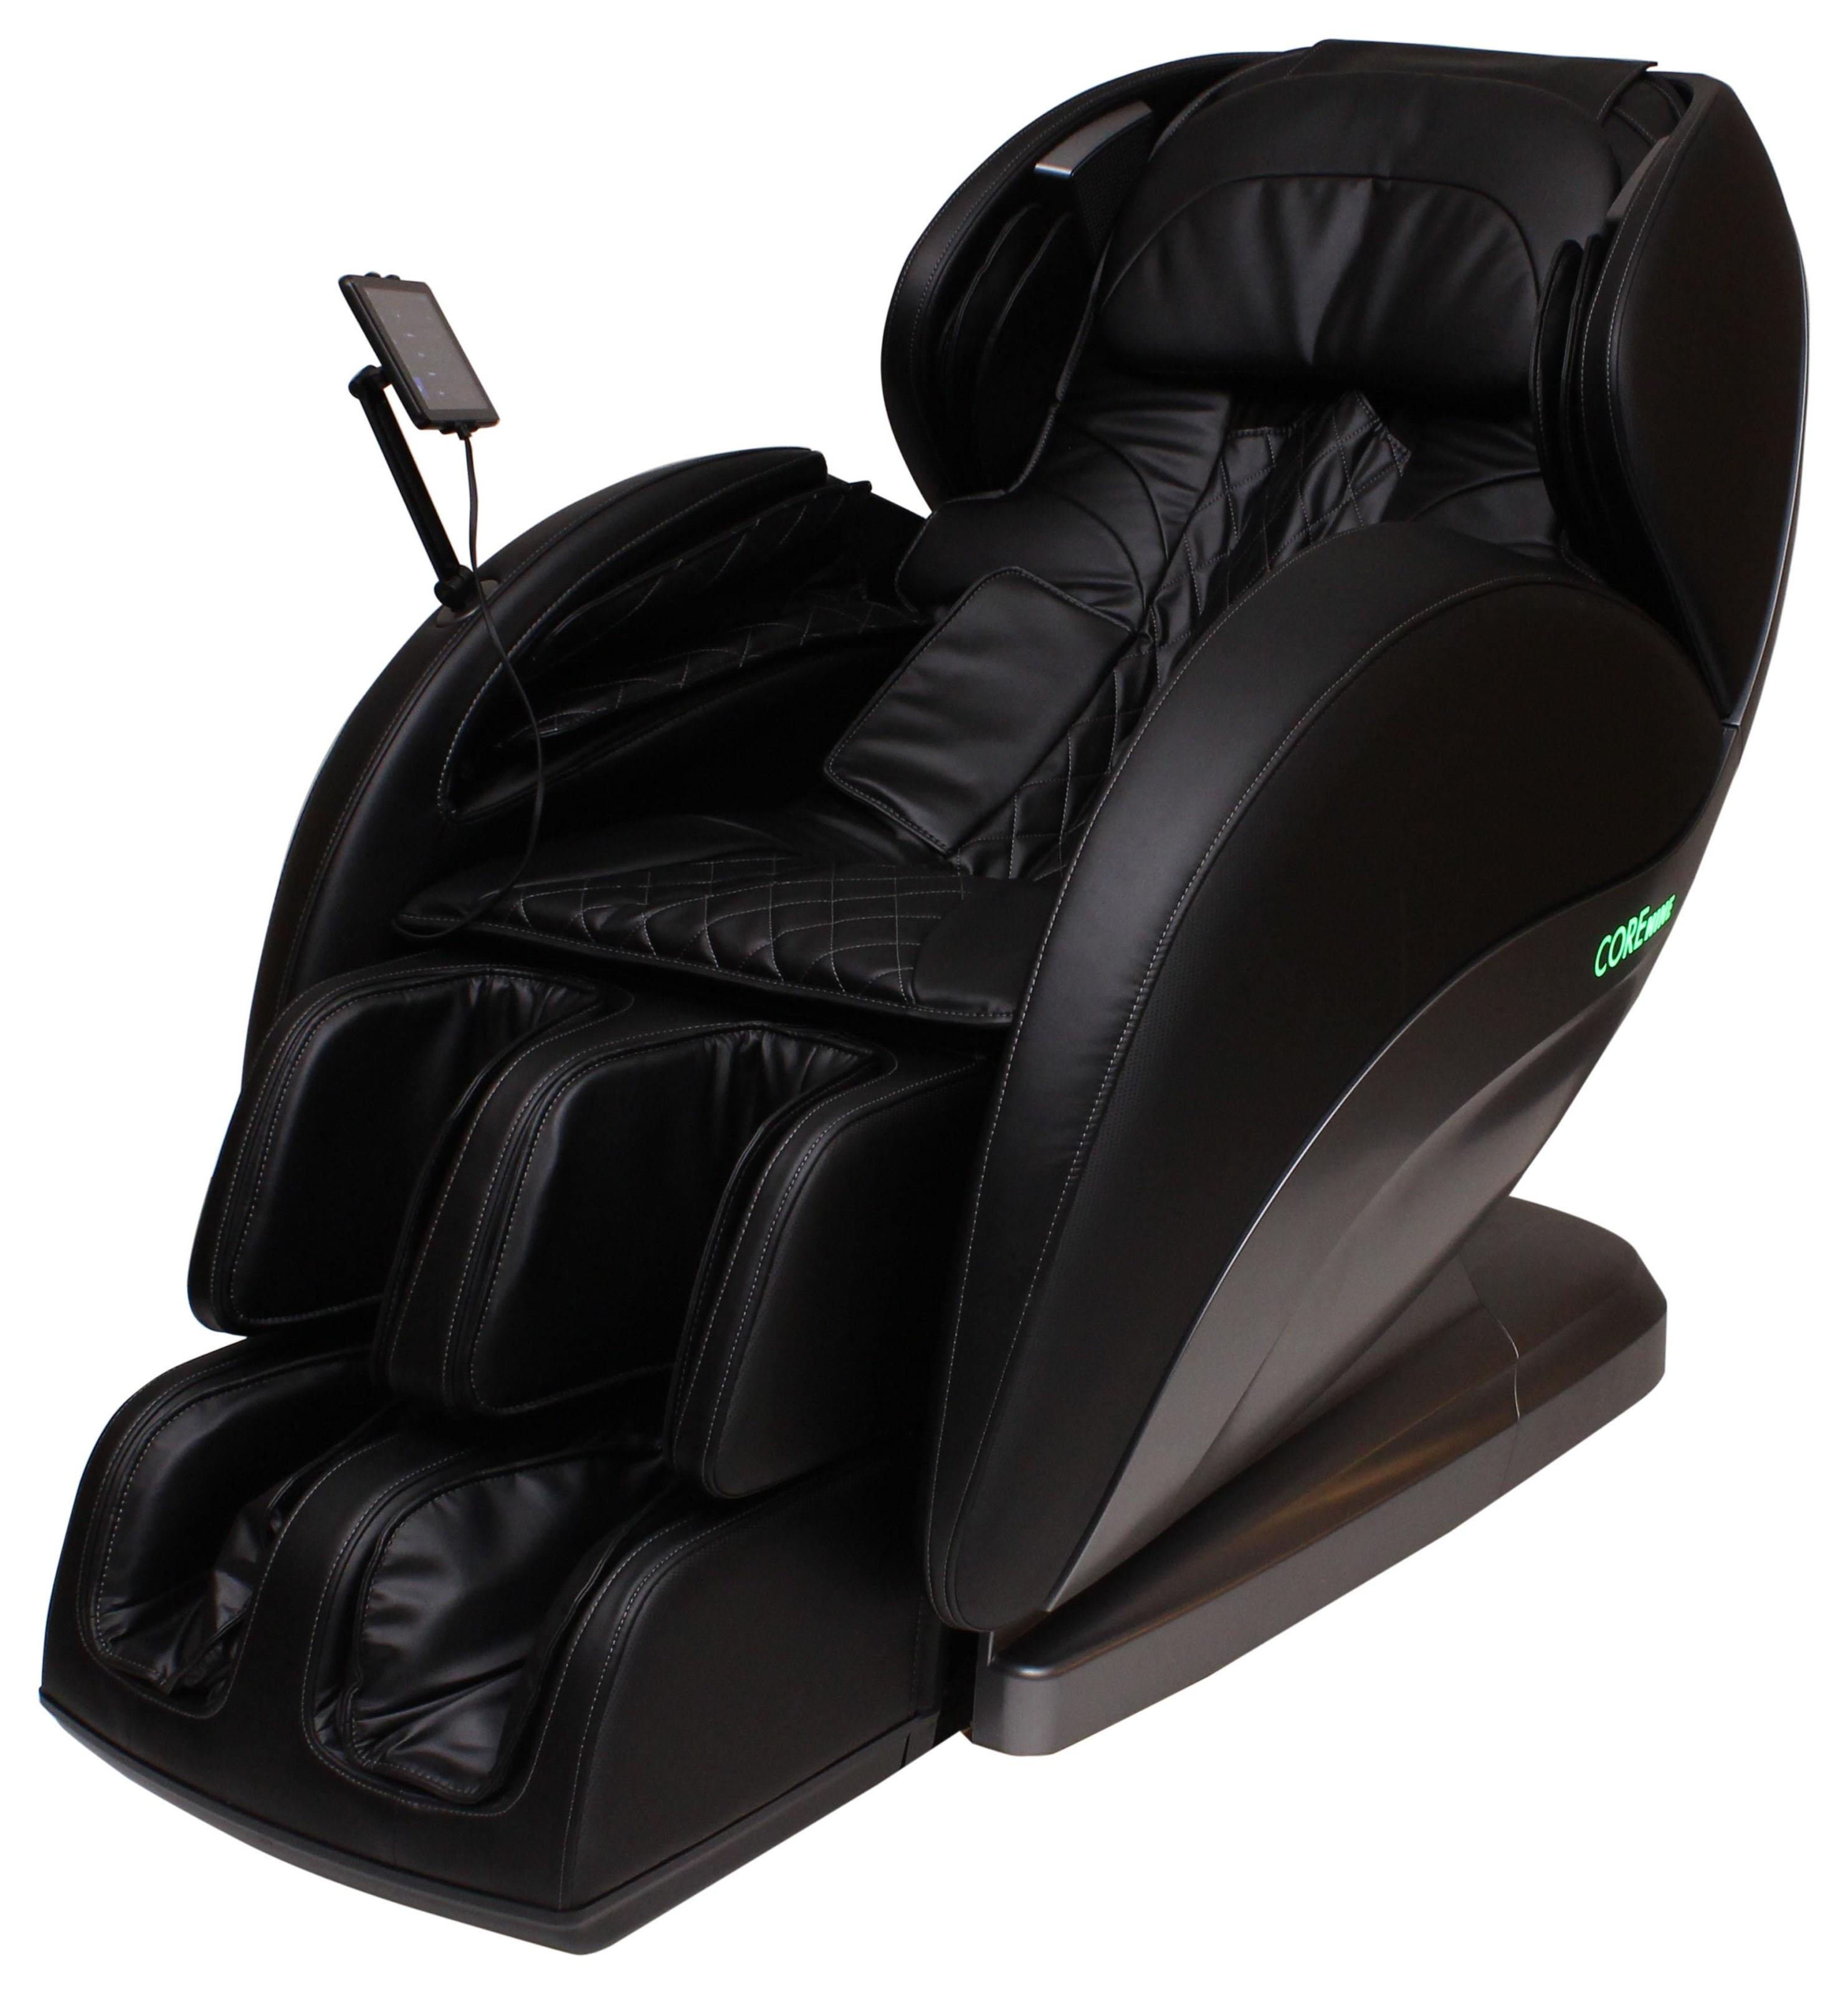 Maximus Massage Chair by Core Nine Massage Technology at HomeWorld Furniture